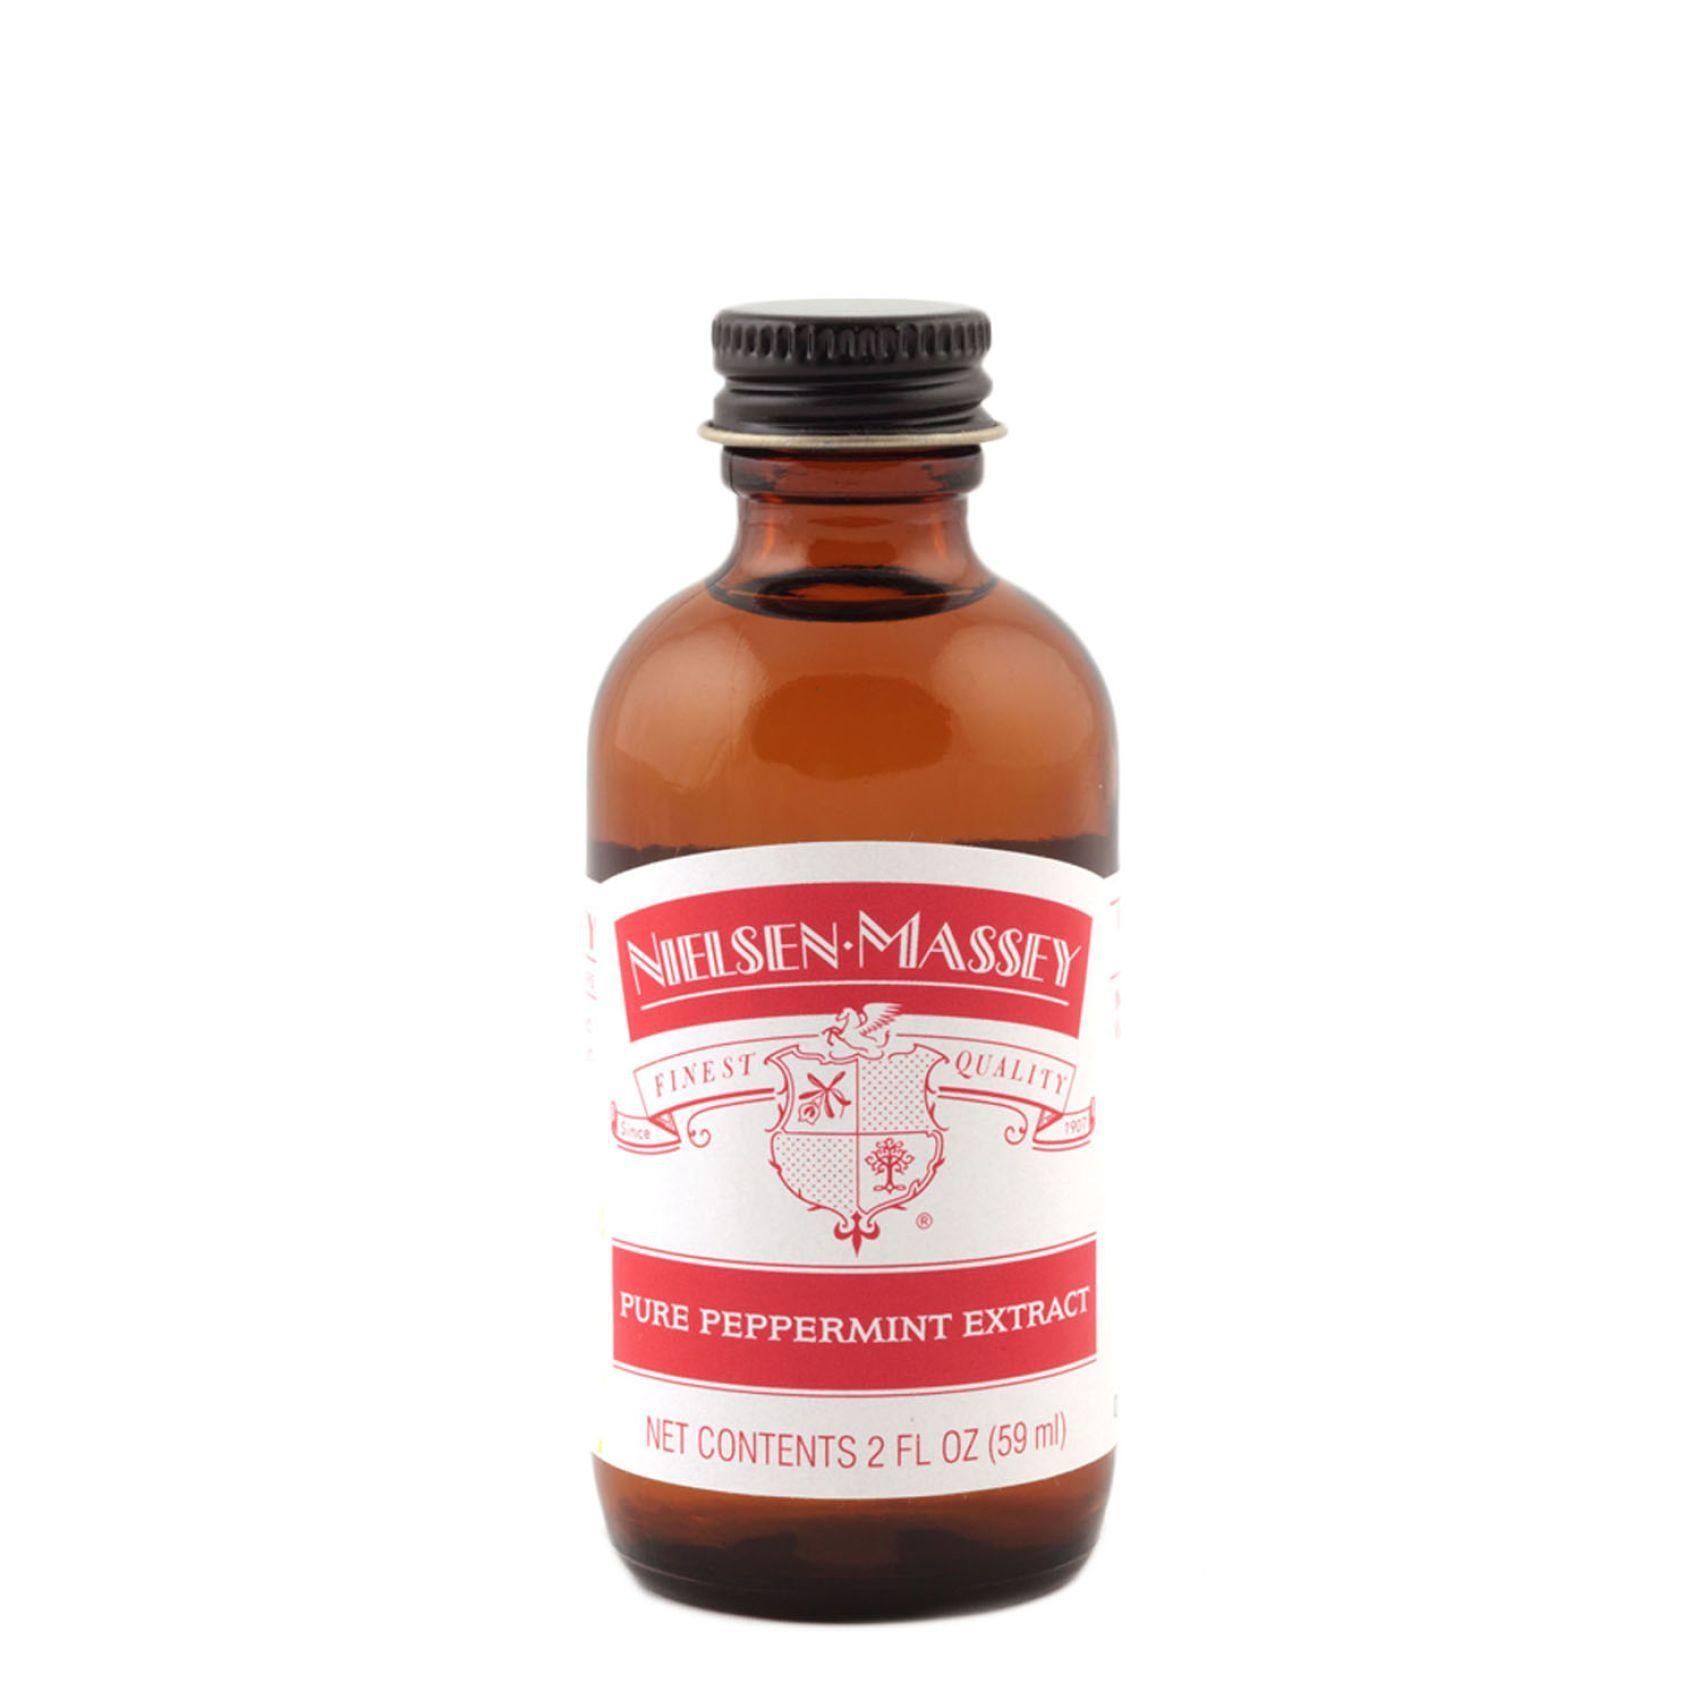 Nielsen Massey Pure Peppermint Extract | Sur La Table